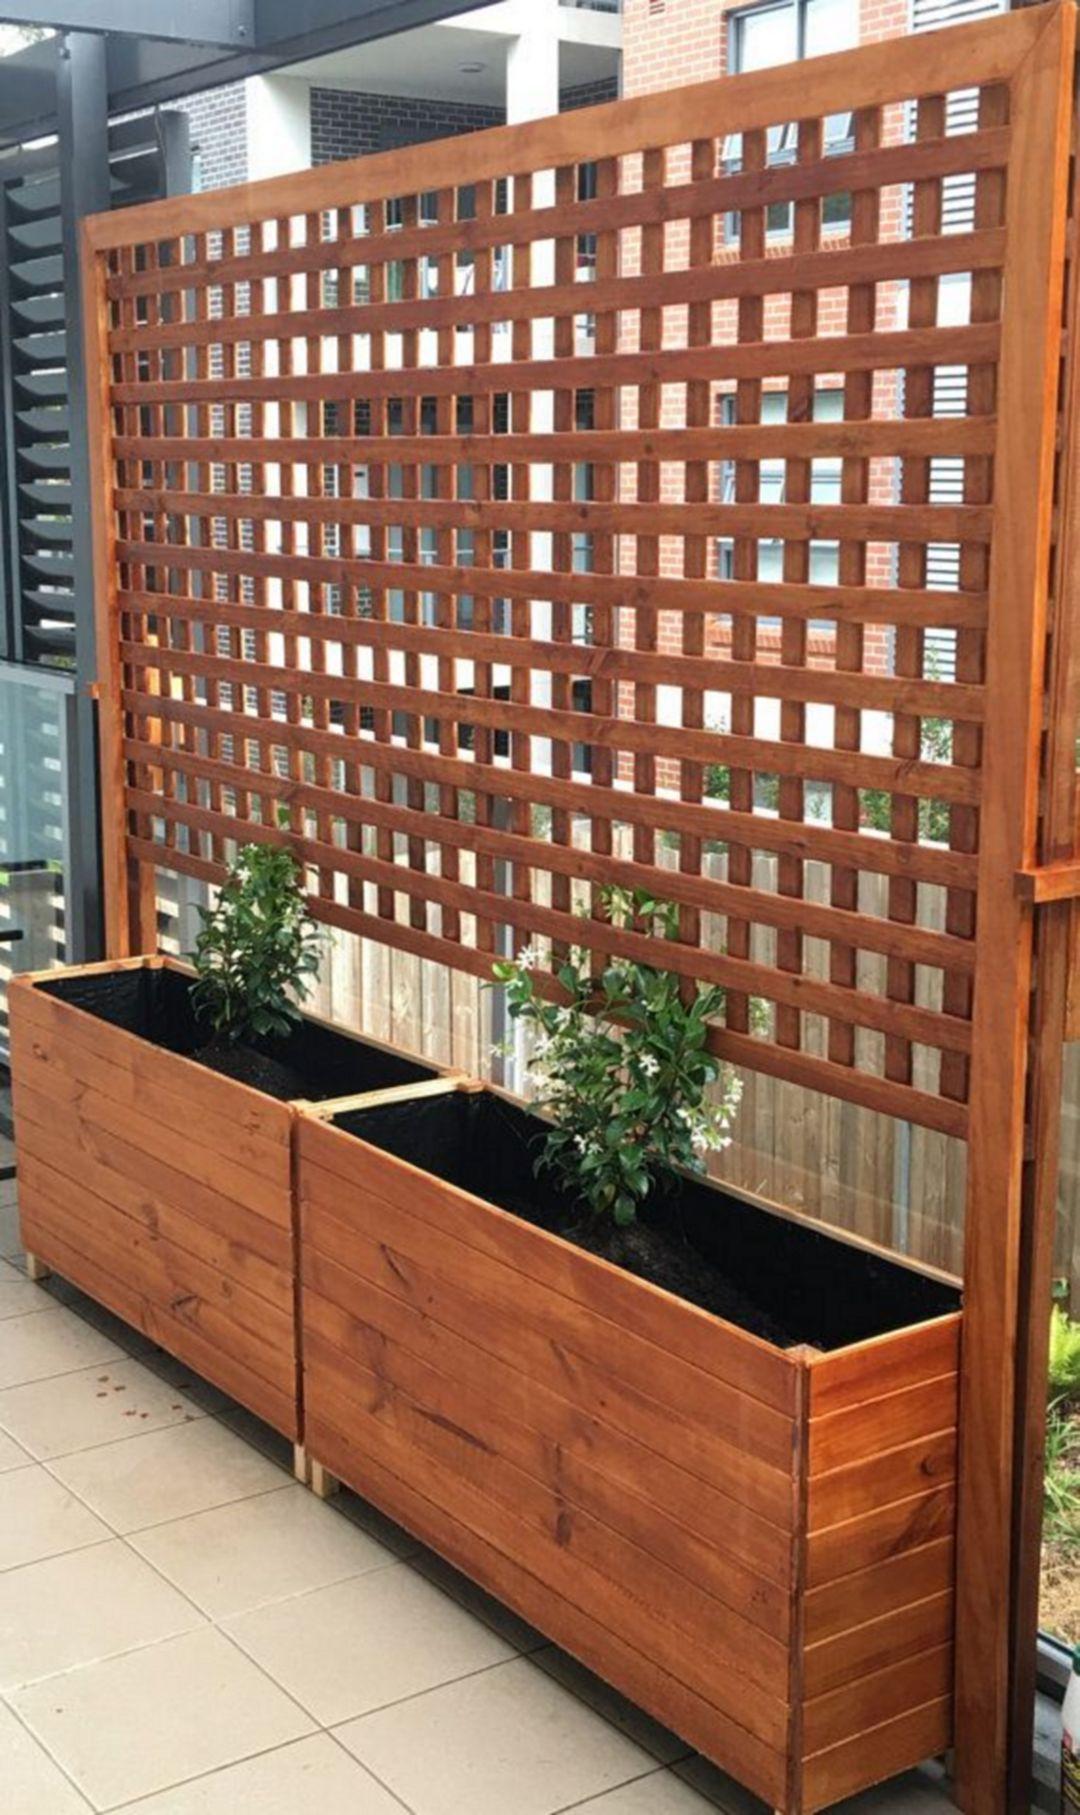 Backyard Privacy Fence Landscaping Ideas On A Budget 151 Privacylandscape Planter Wall